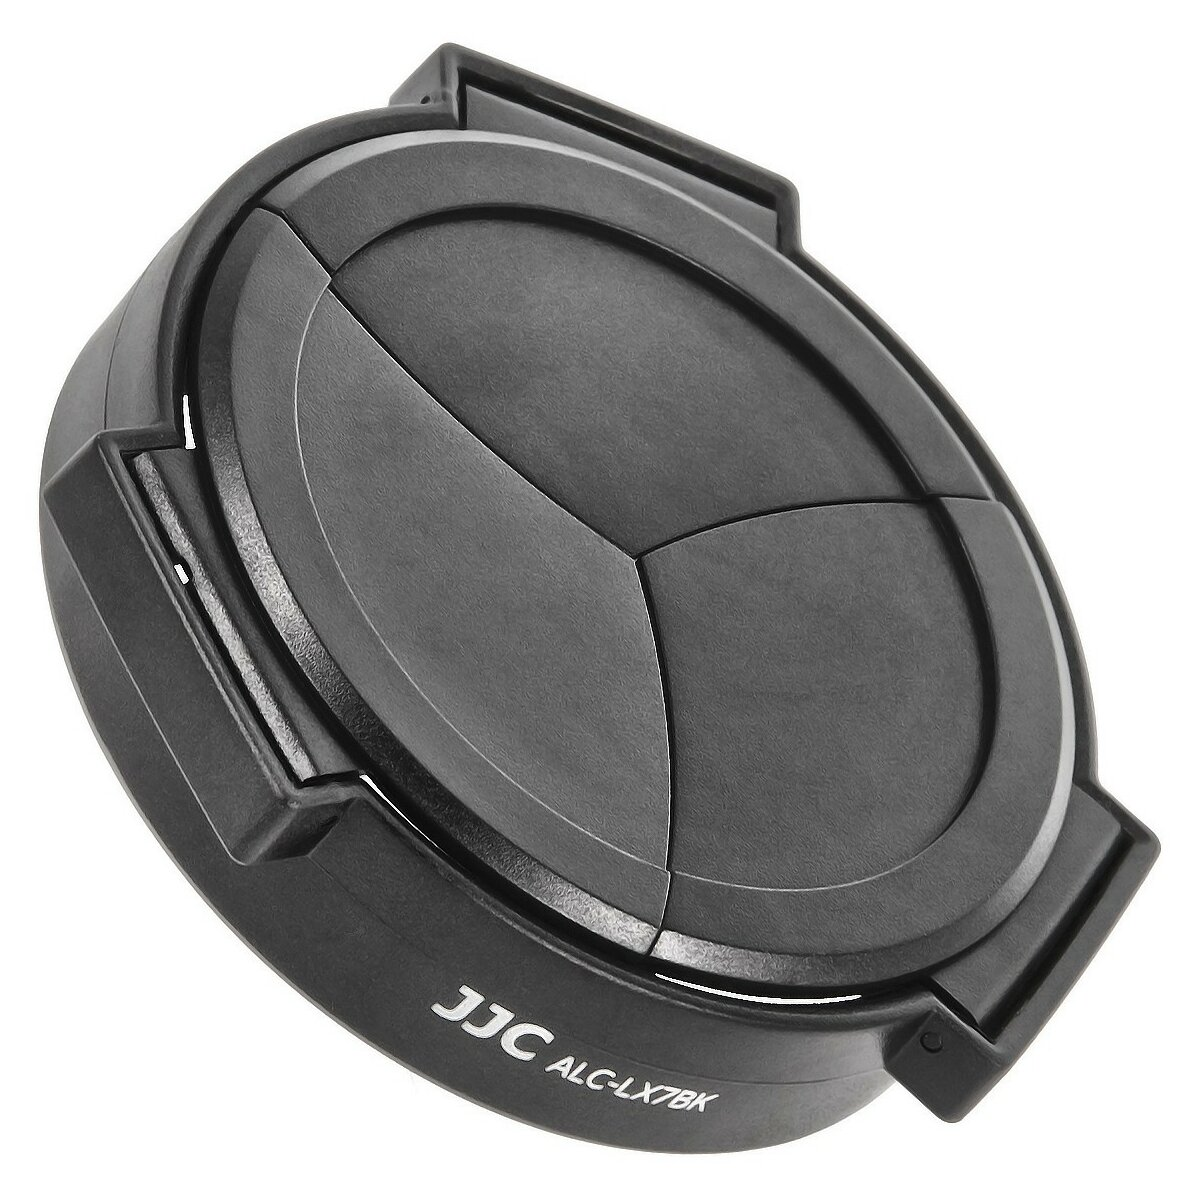 JJC Automatik Objektivdeckel, Frontdeckel fuer Panasonic DMC-LX7 & LEICA D-LUX6 - ALC-LX7 schwarz